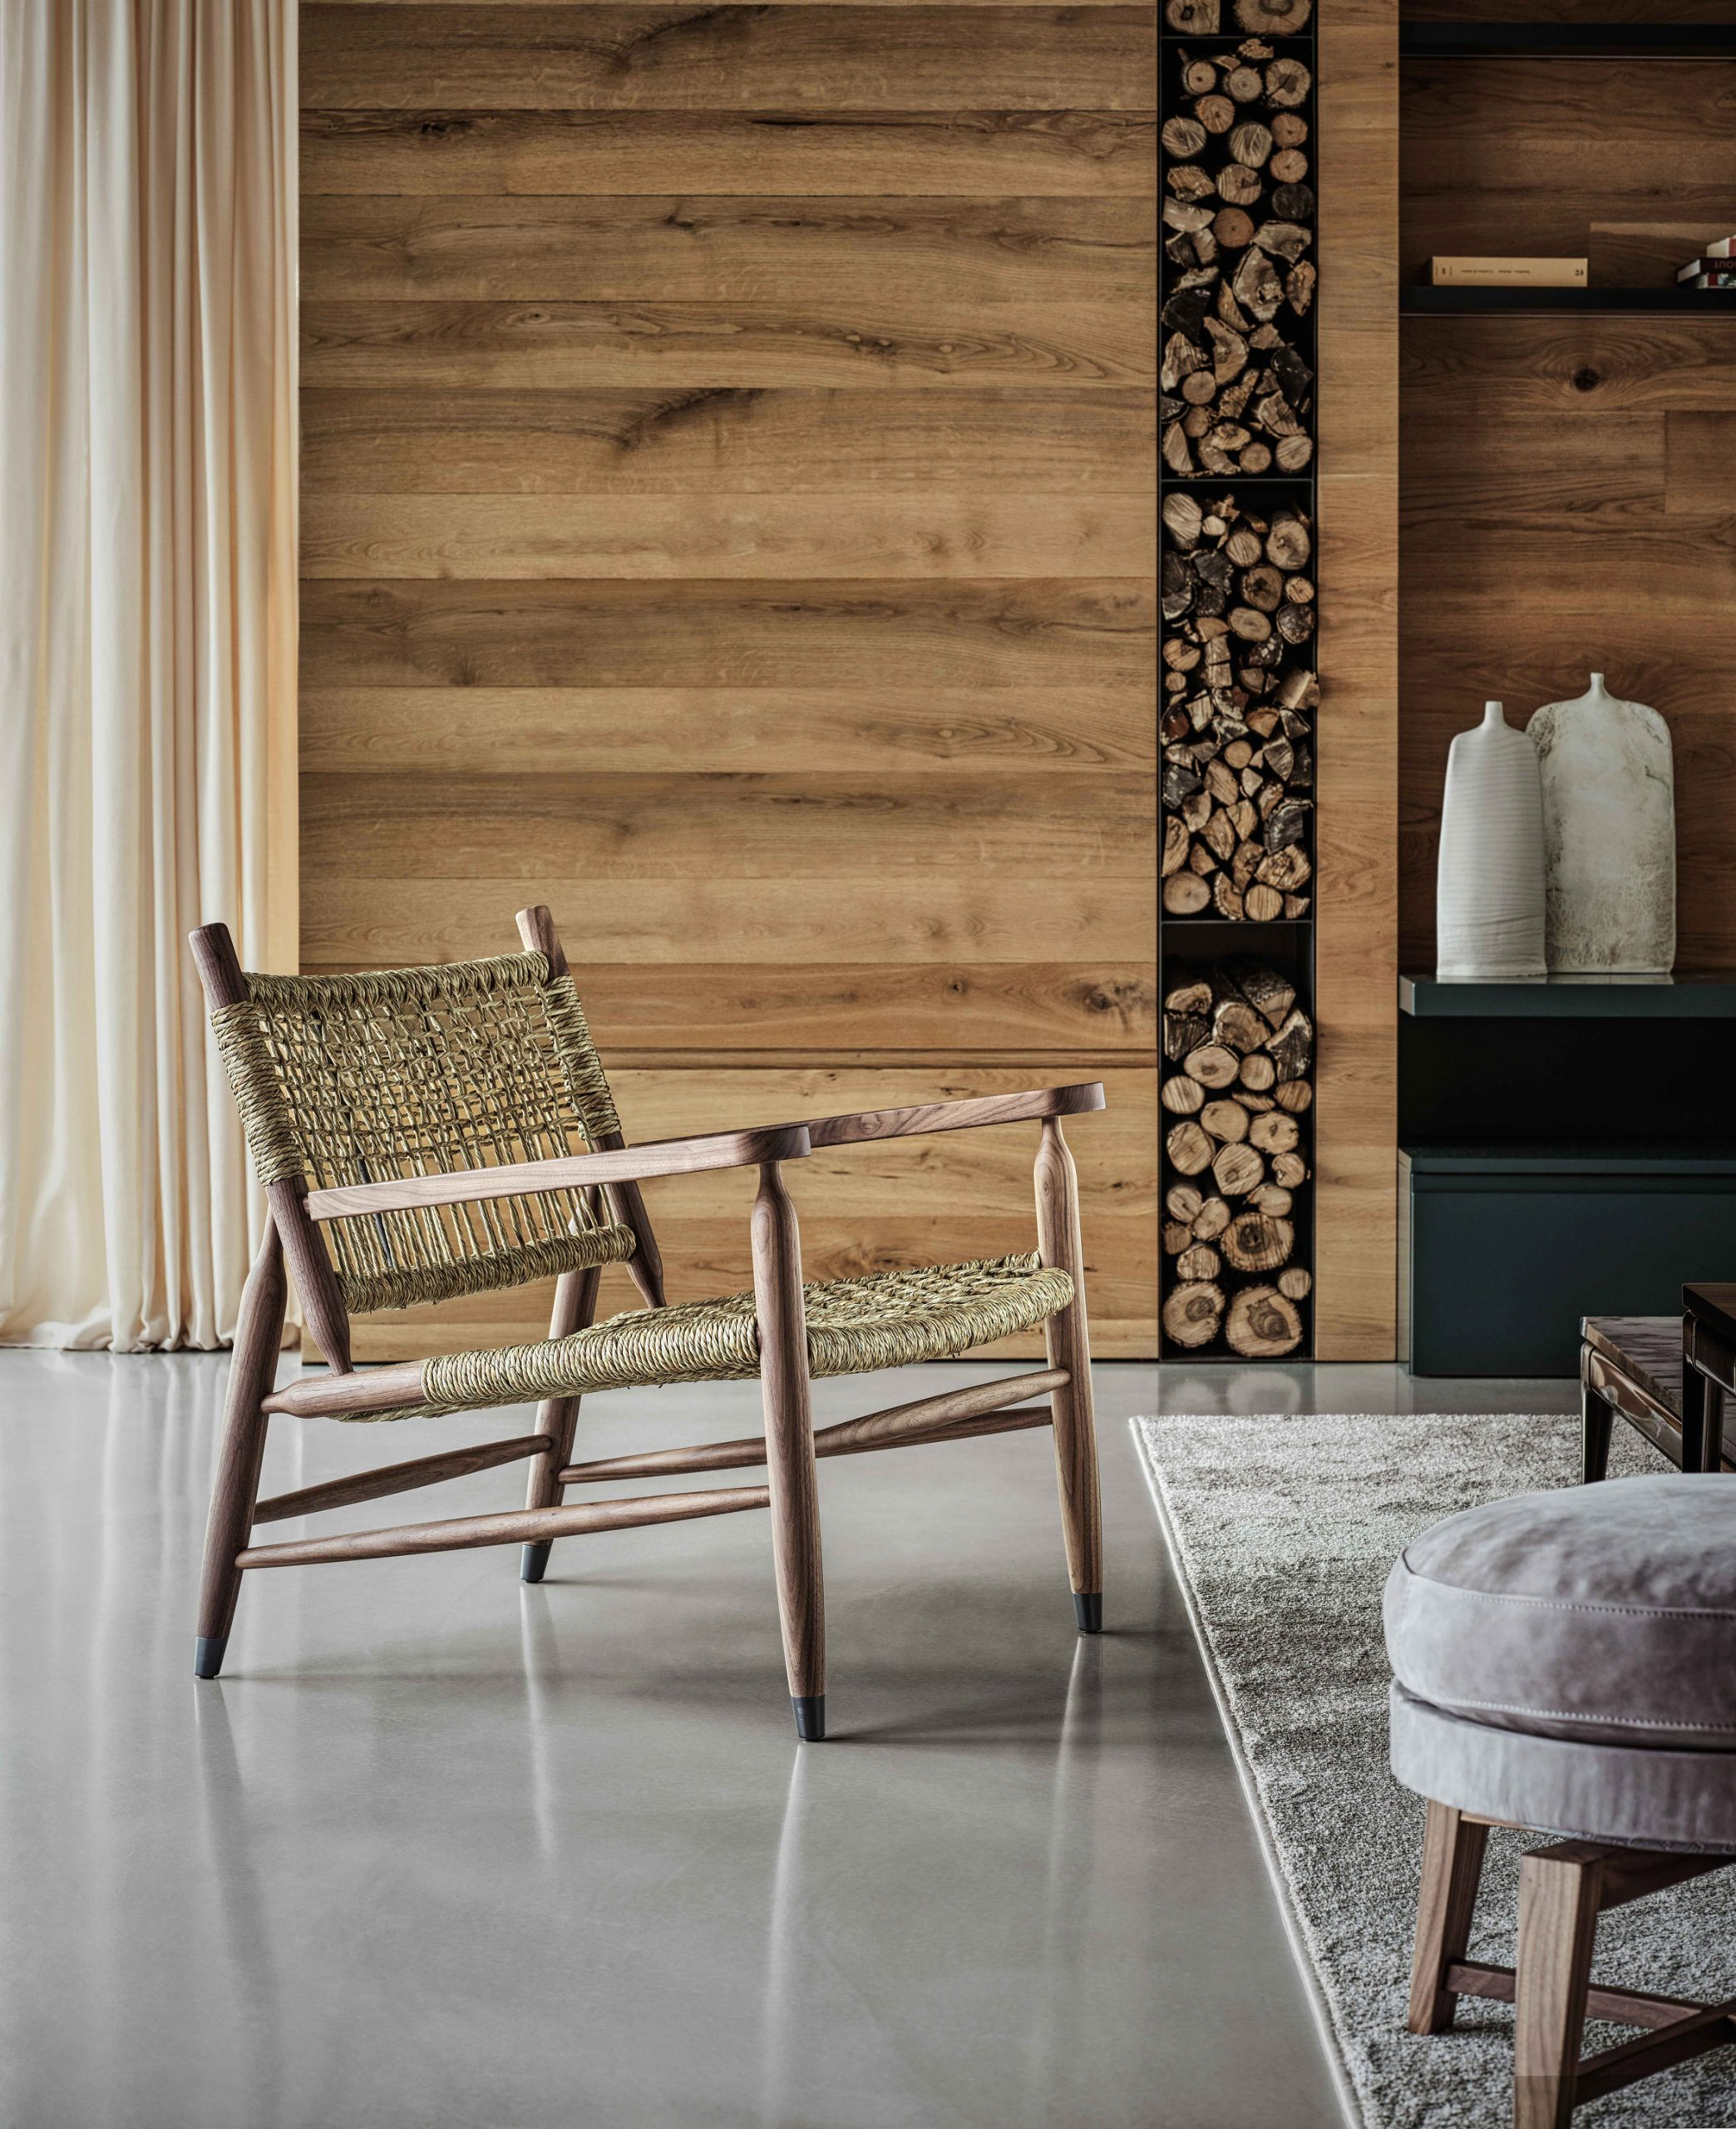 Tessa armchair by Antonio Citterio for Flexform